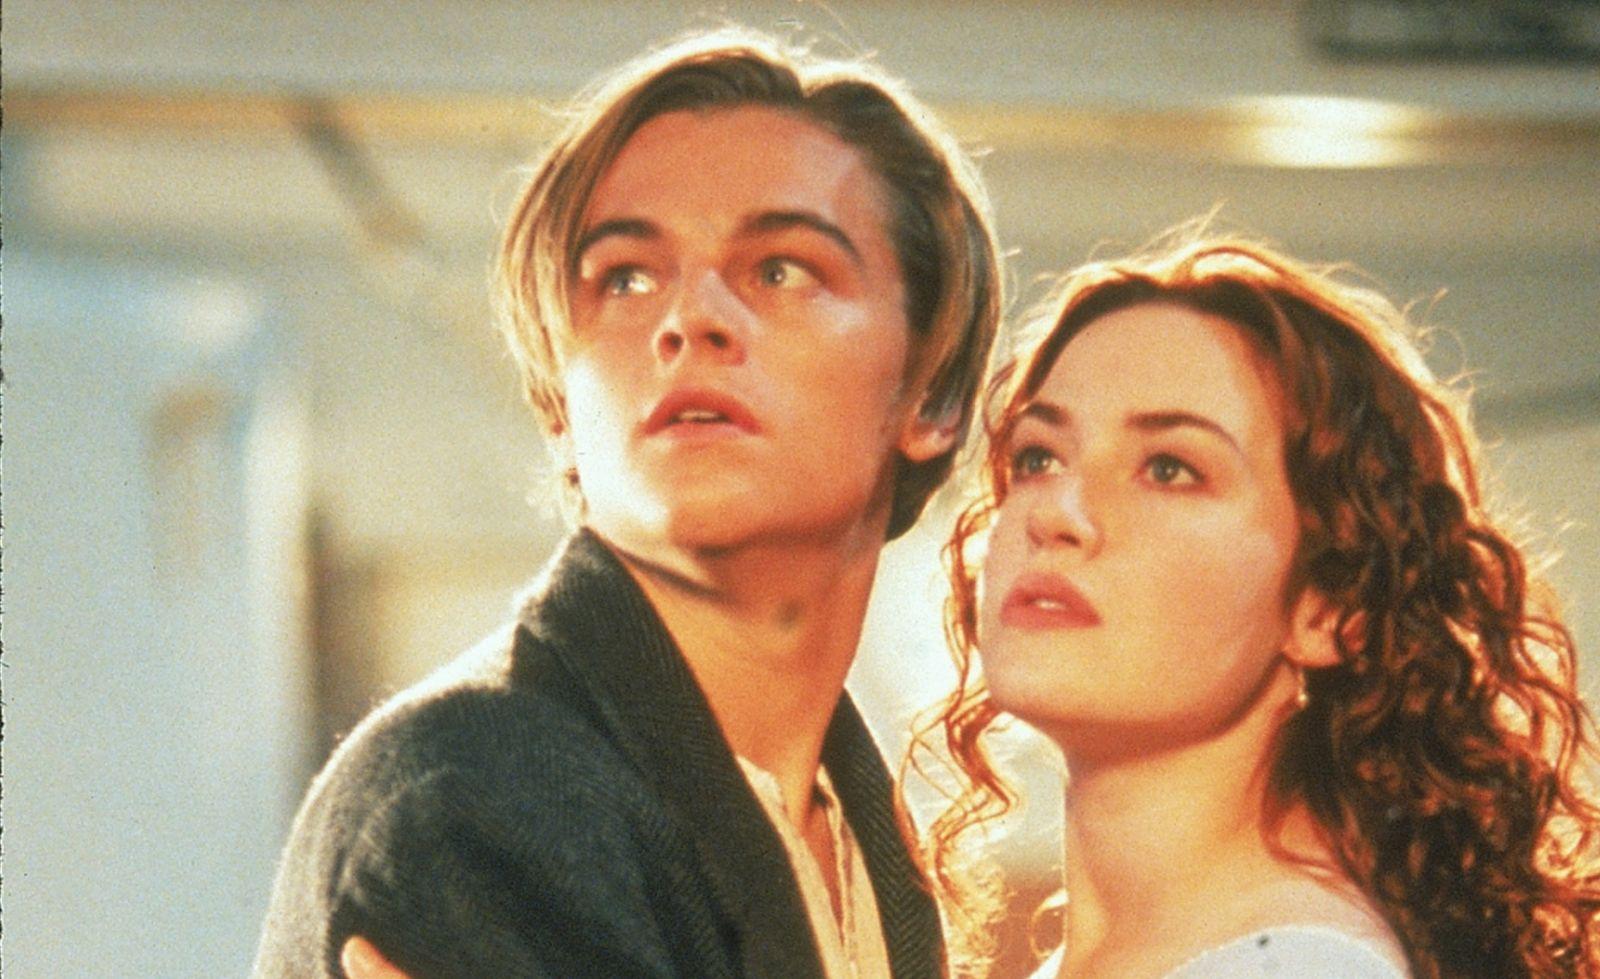 DiCaprio Cameron intervista Winslet